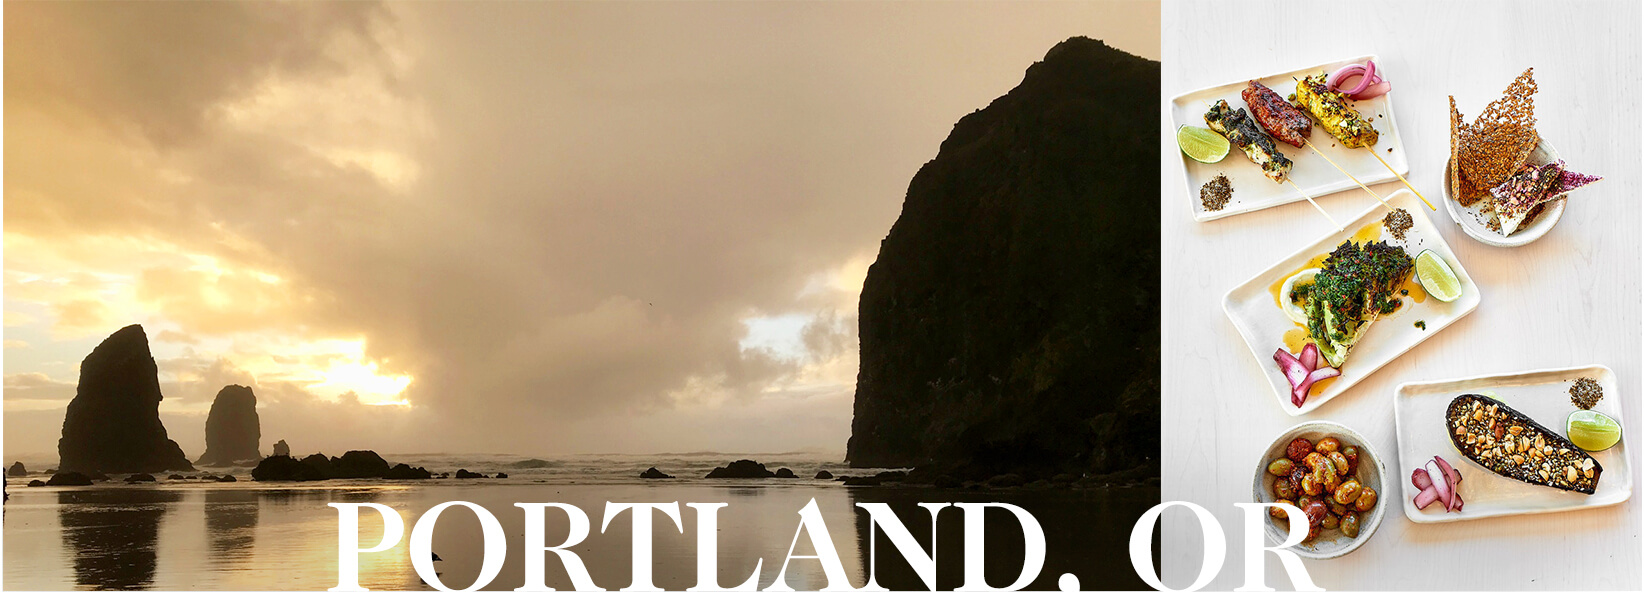 Portland, Oregon banner